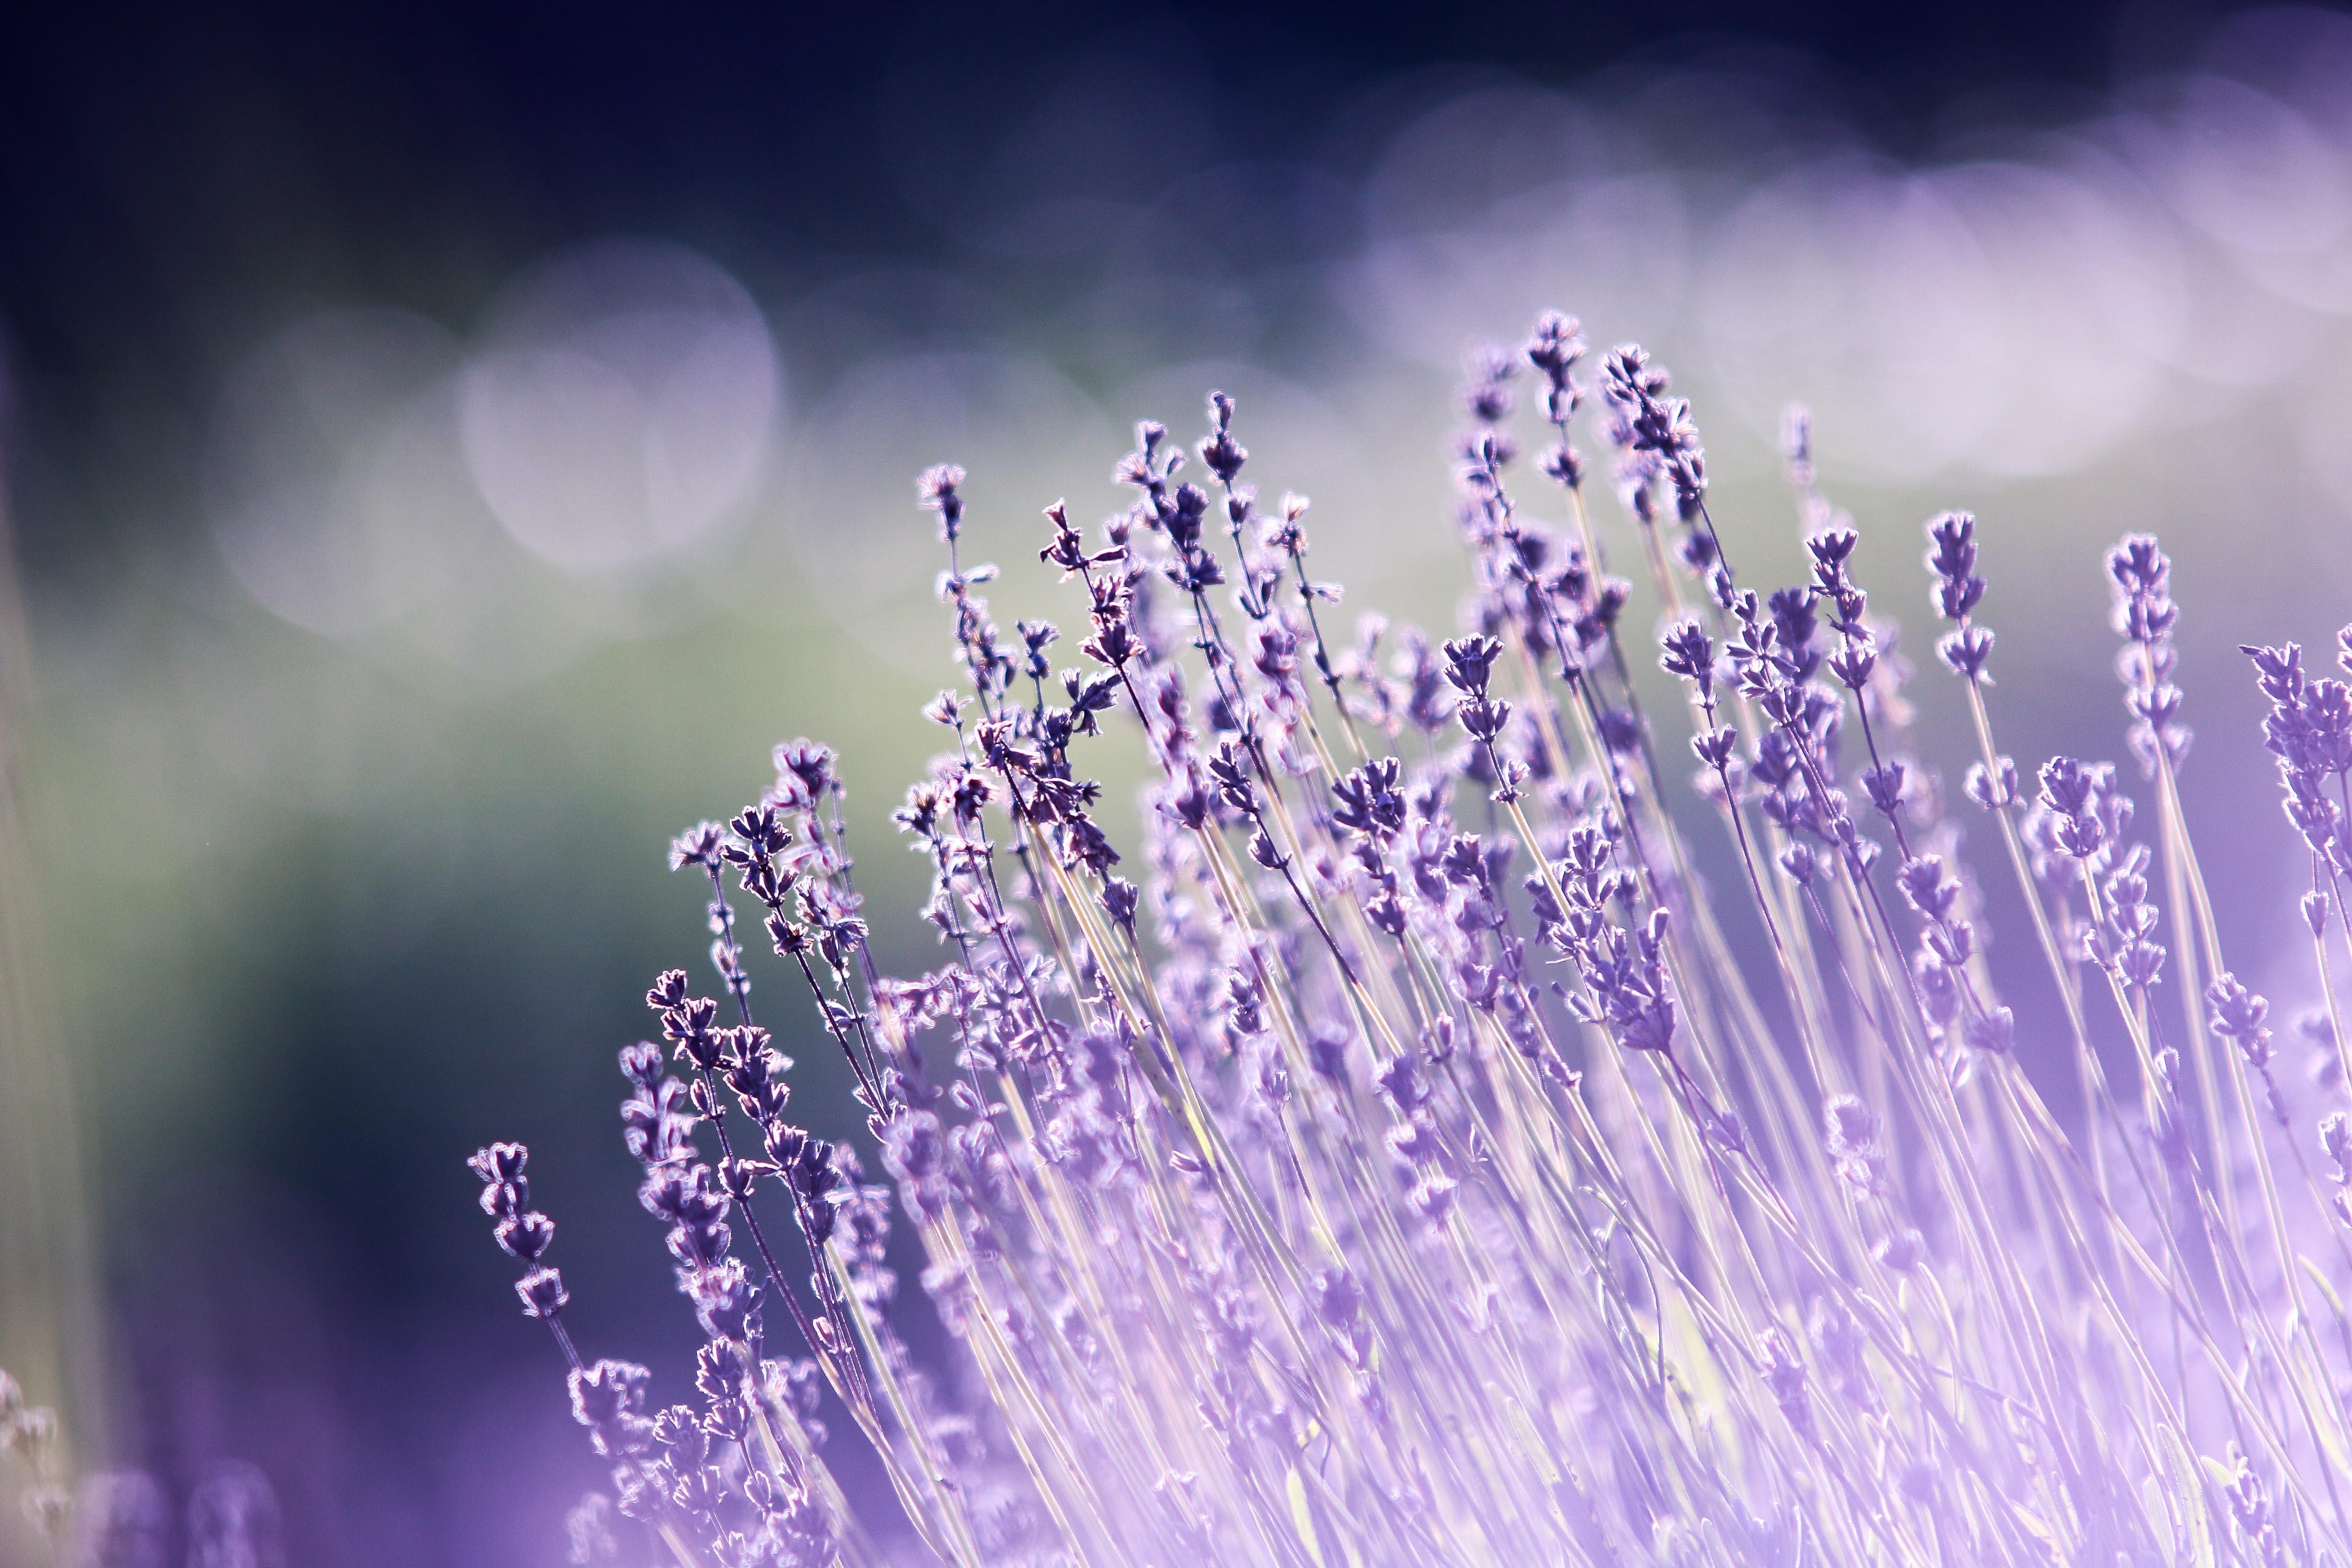 hinh anh lavender 52